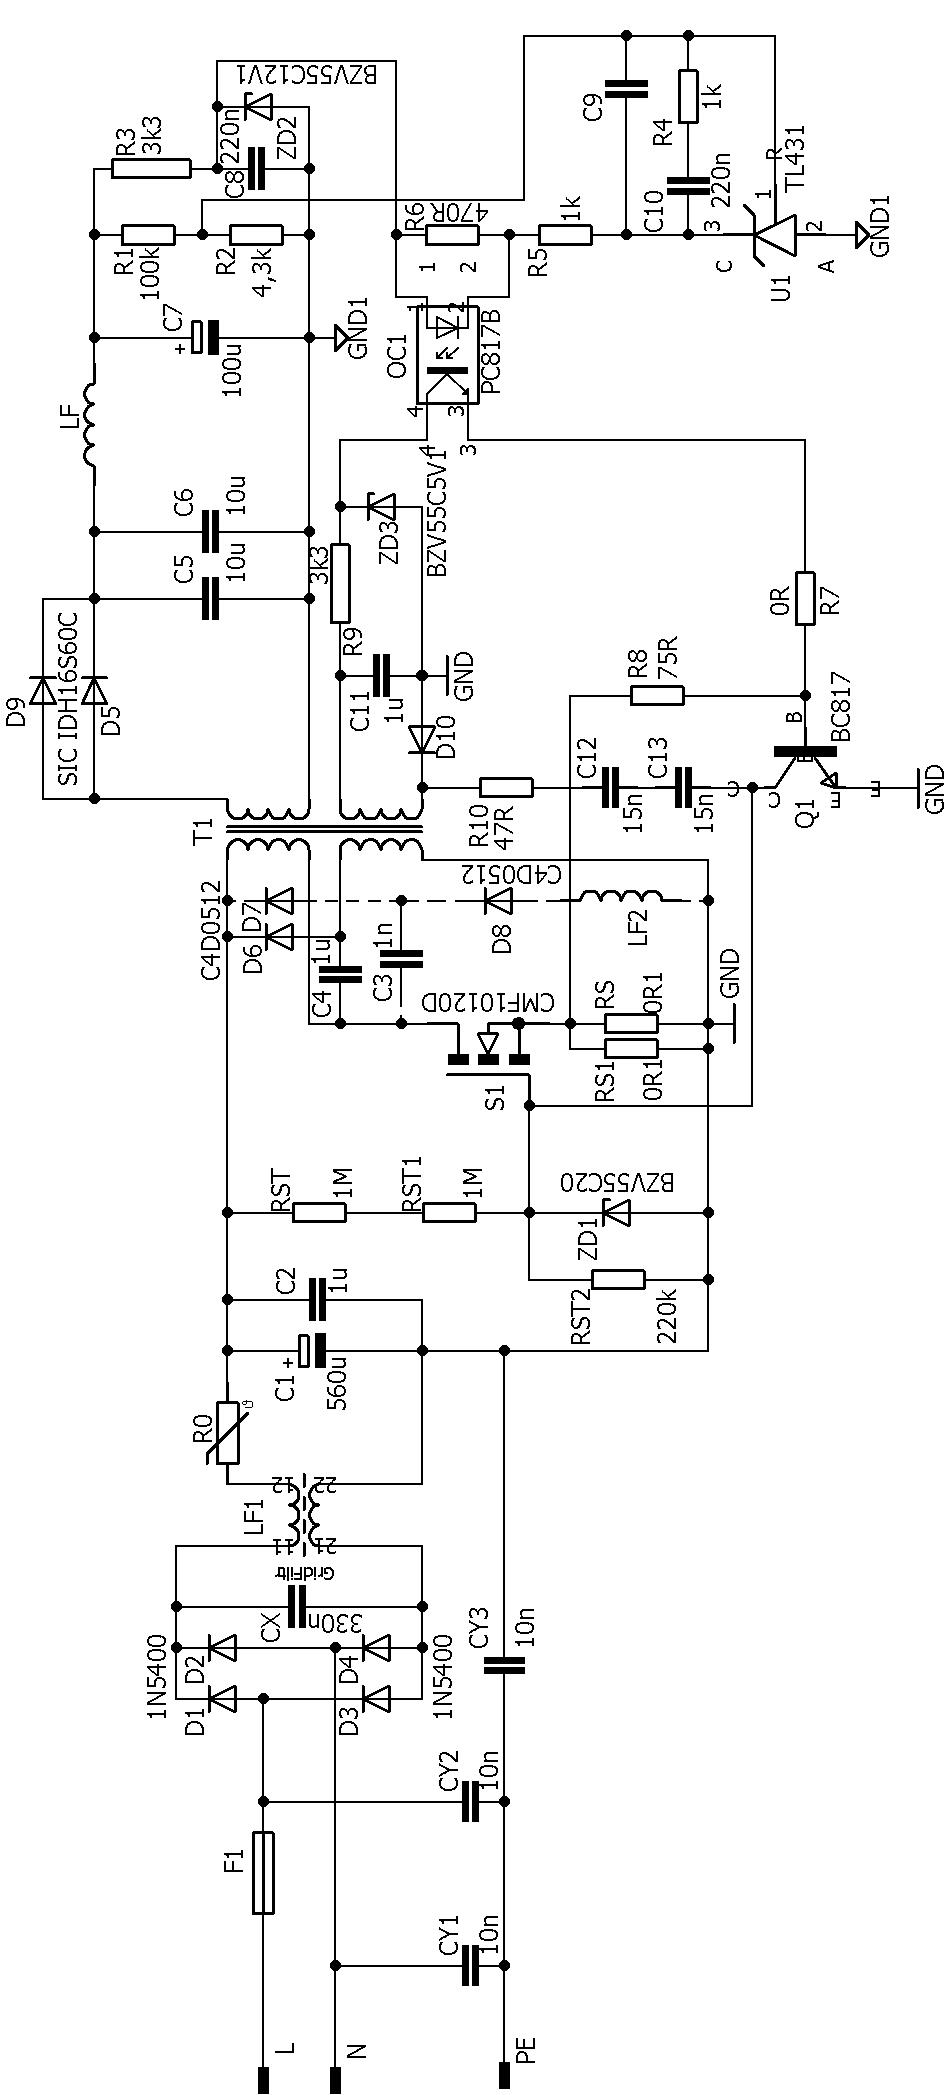 self oscillating smps circuit flyback 600w 60v 120khz 600w smps circuit schematic self oscillating smps 120x120 [ 952 x 2095 Pixel ]